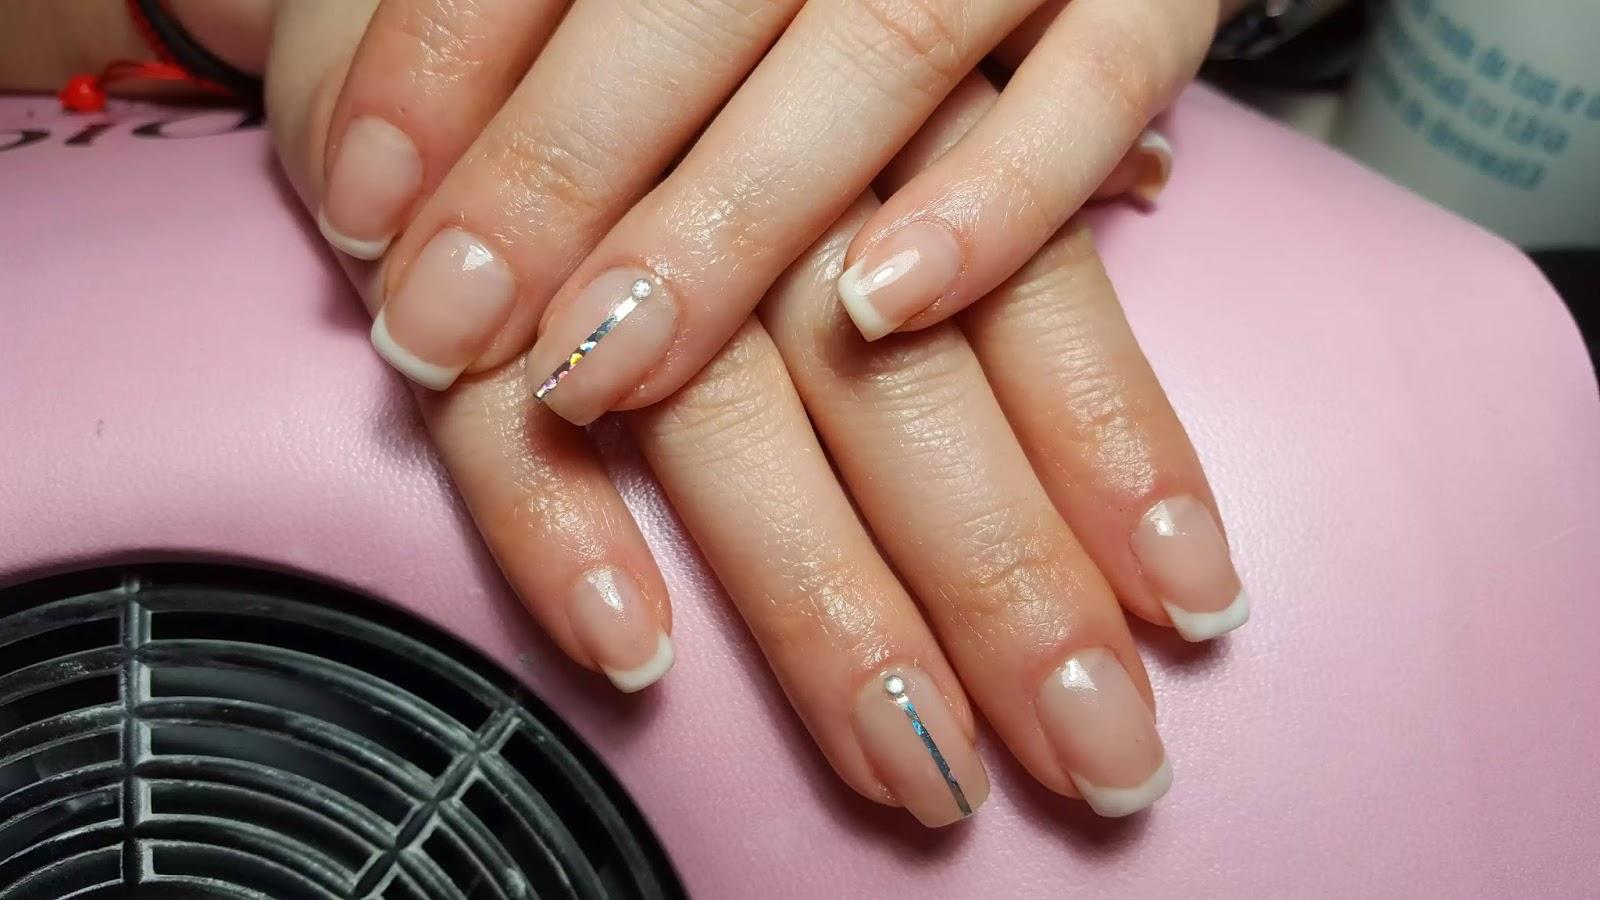 Colour your life: Soak-off gel nails